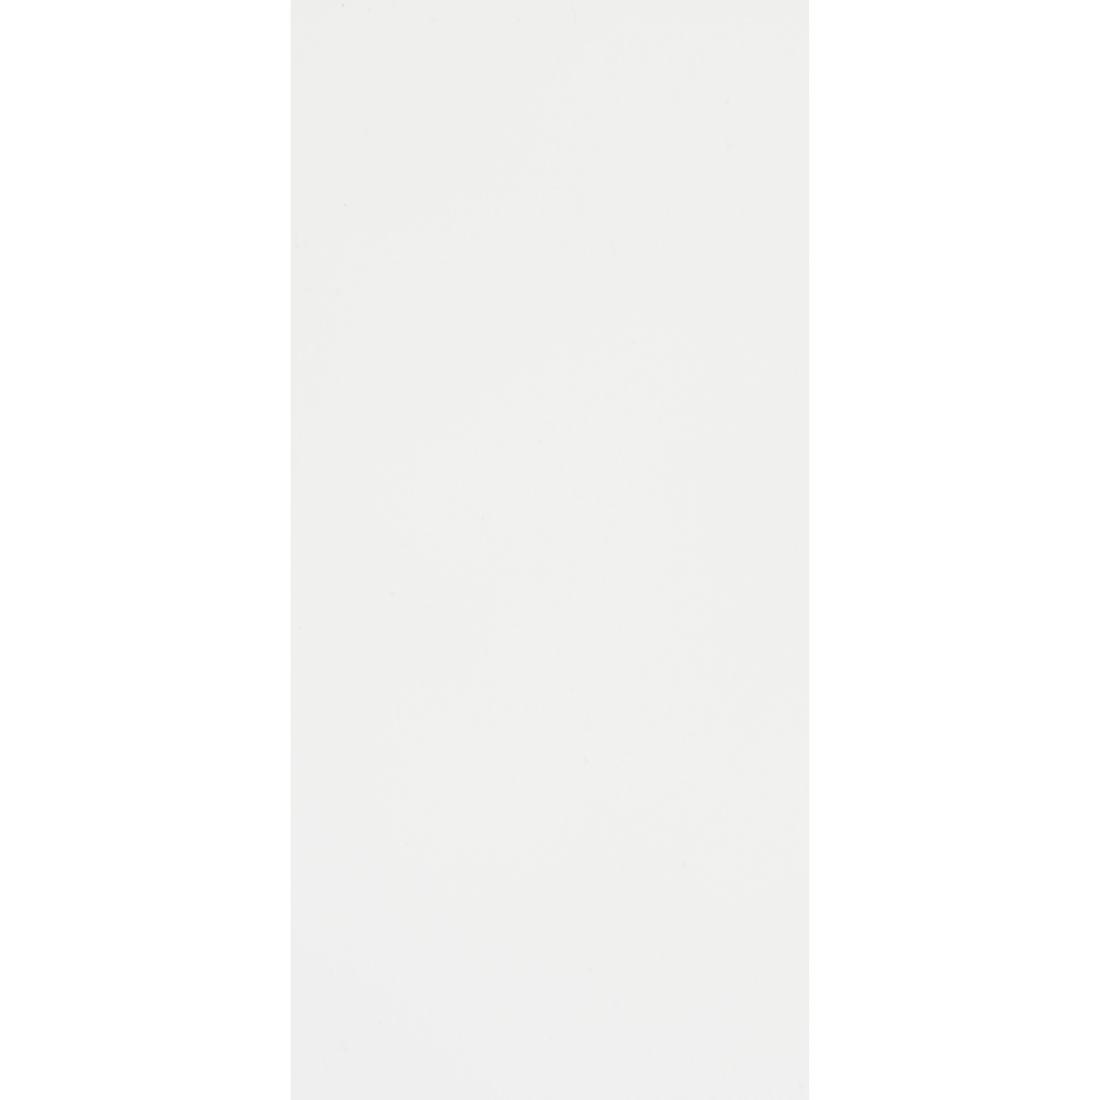 Aqua Wall Lining Panel Polar White Gloss 2400 x 1200 x 2.7mm